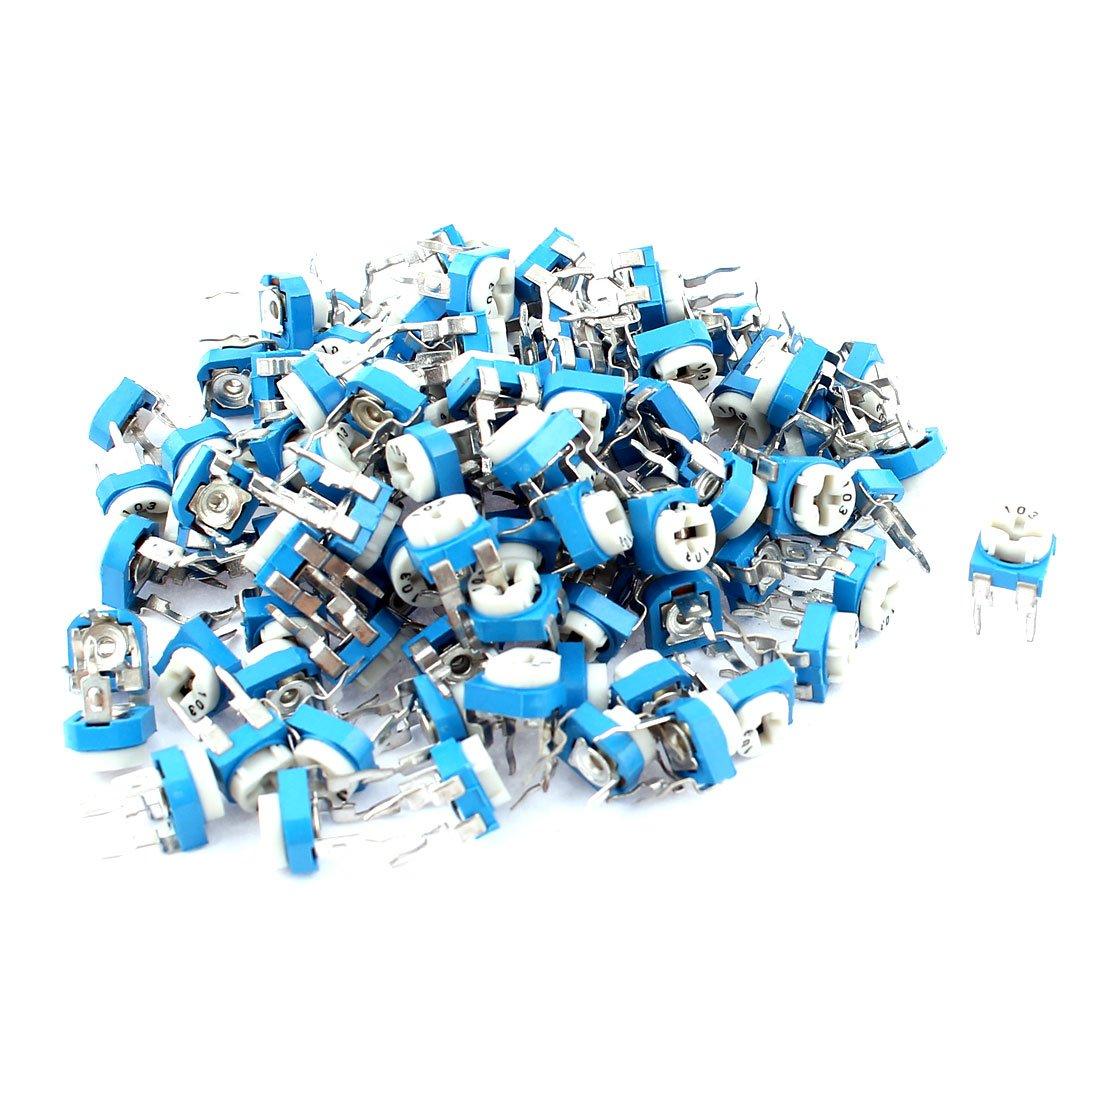 sourcingmap® 10K ohm Vertical Variable Resistor Trimmer Potentiometer Blue 100Pcs a15070400ux0557